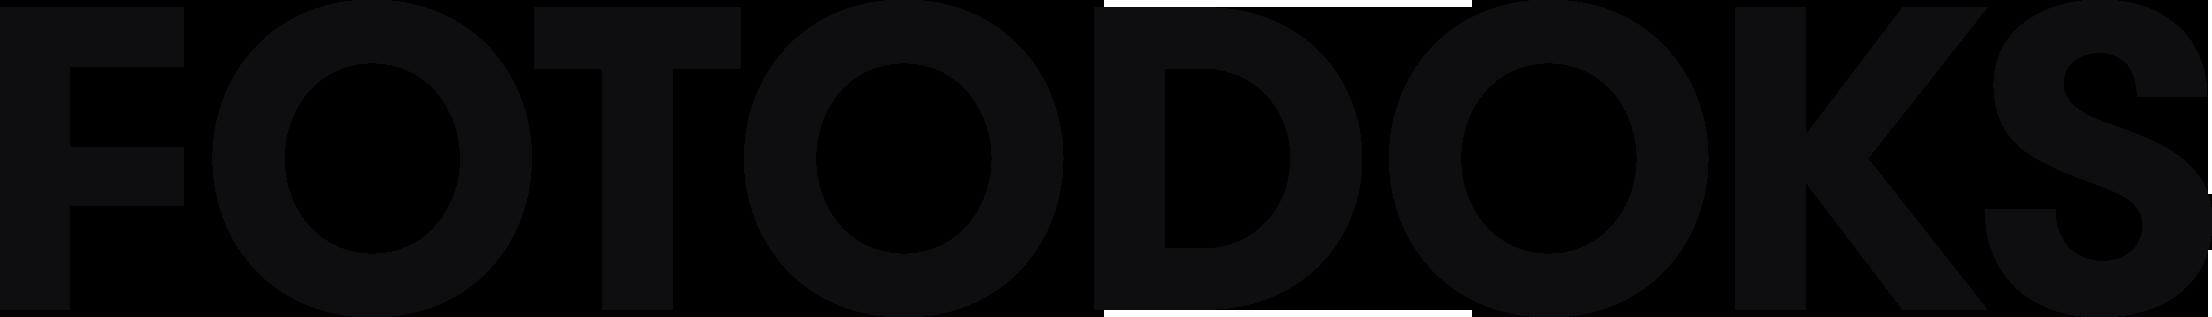 Fotodoks_logo_schwarz.png